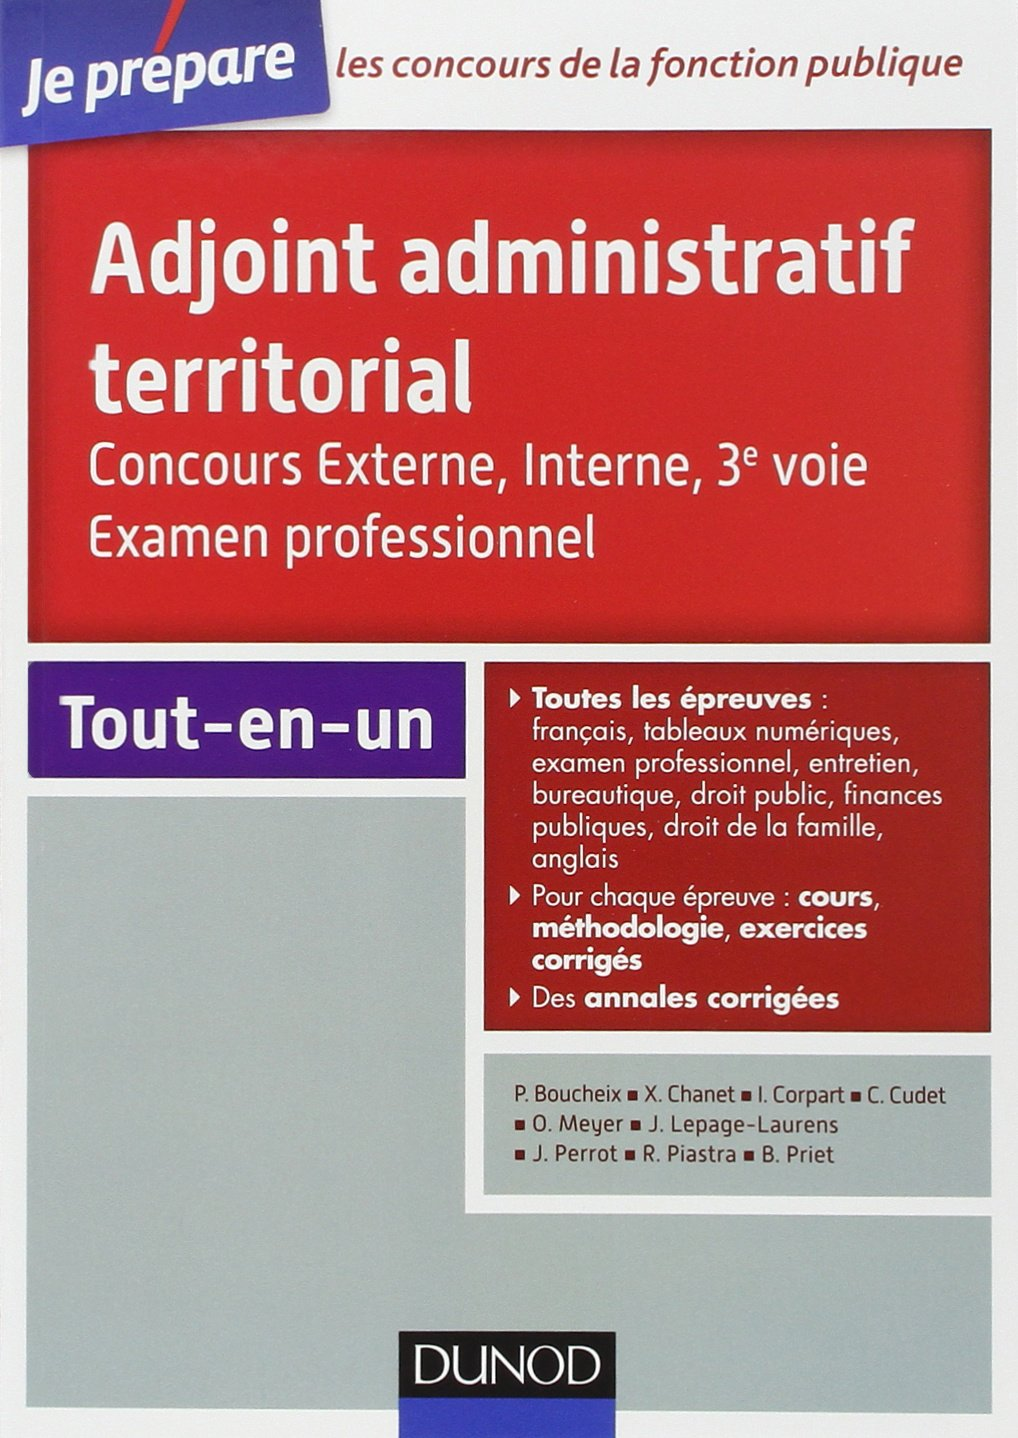 Adjoint administratif territorial - Concours et Examen professionel Broché – 9 octobre 2013 Odile Meyer Jean Lepage-Laurens Benoît Priet Philippe Boucheix